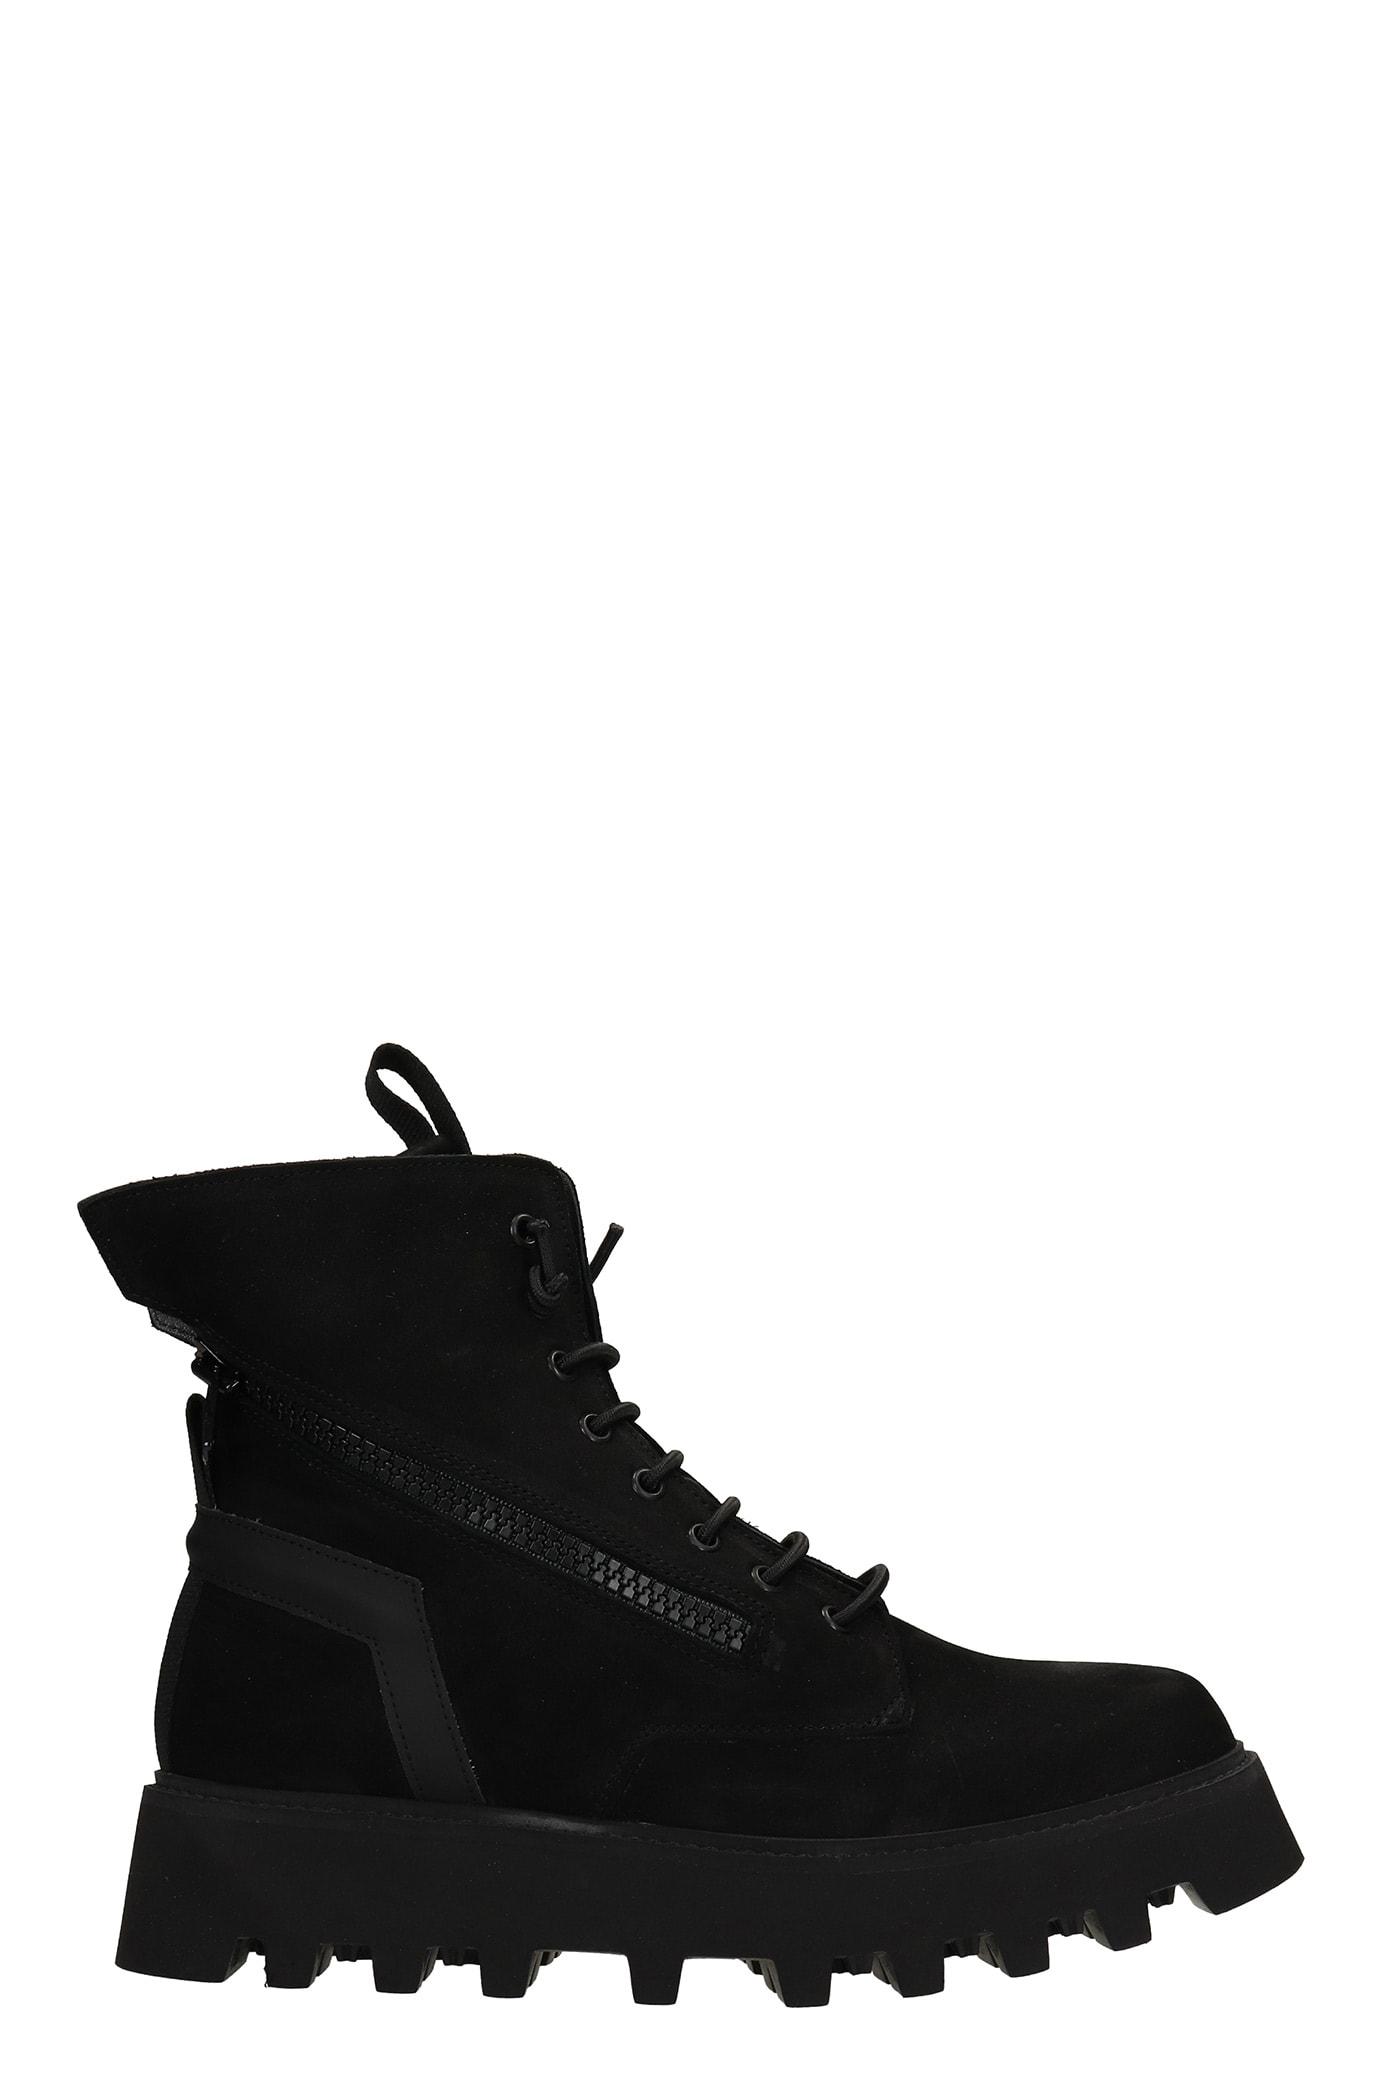 Doc Combat Boots In Black Nubuck